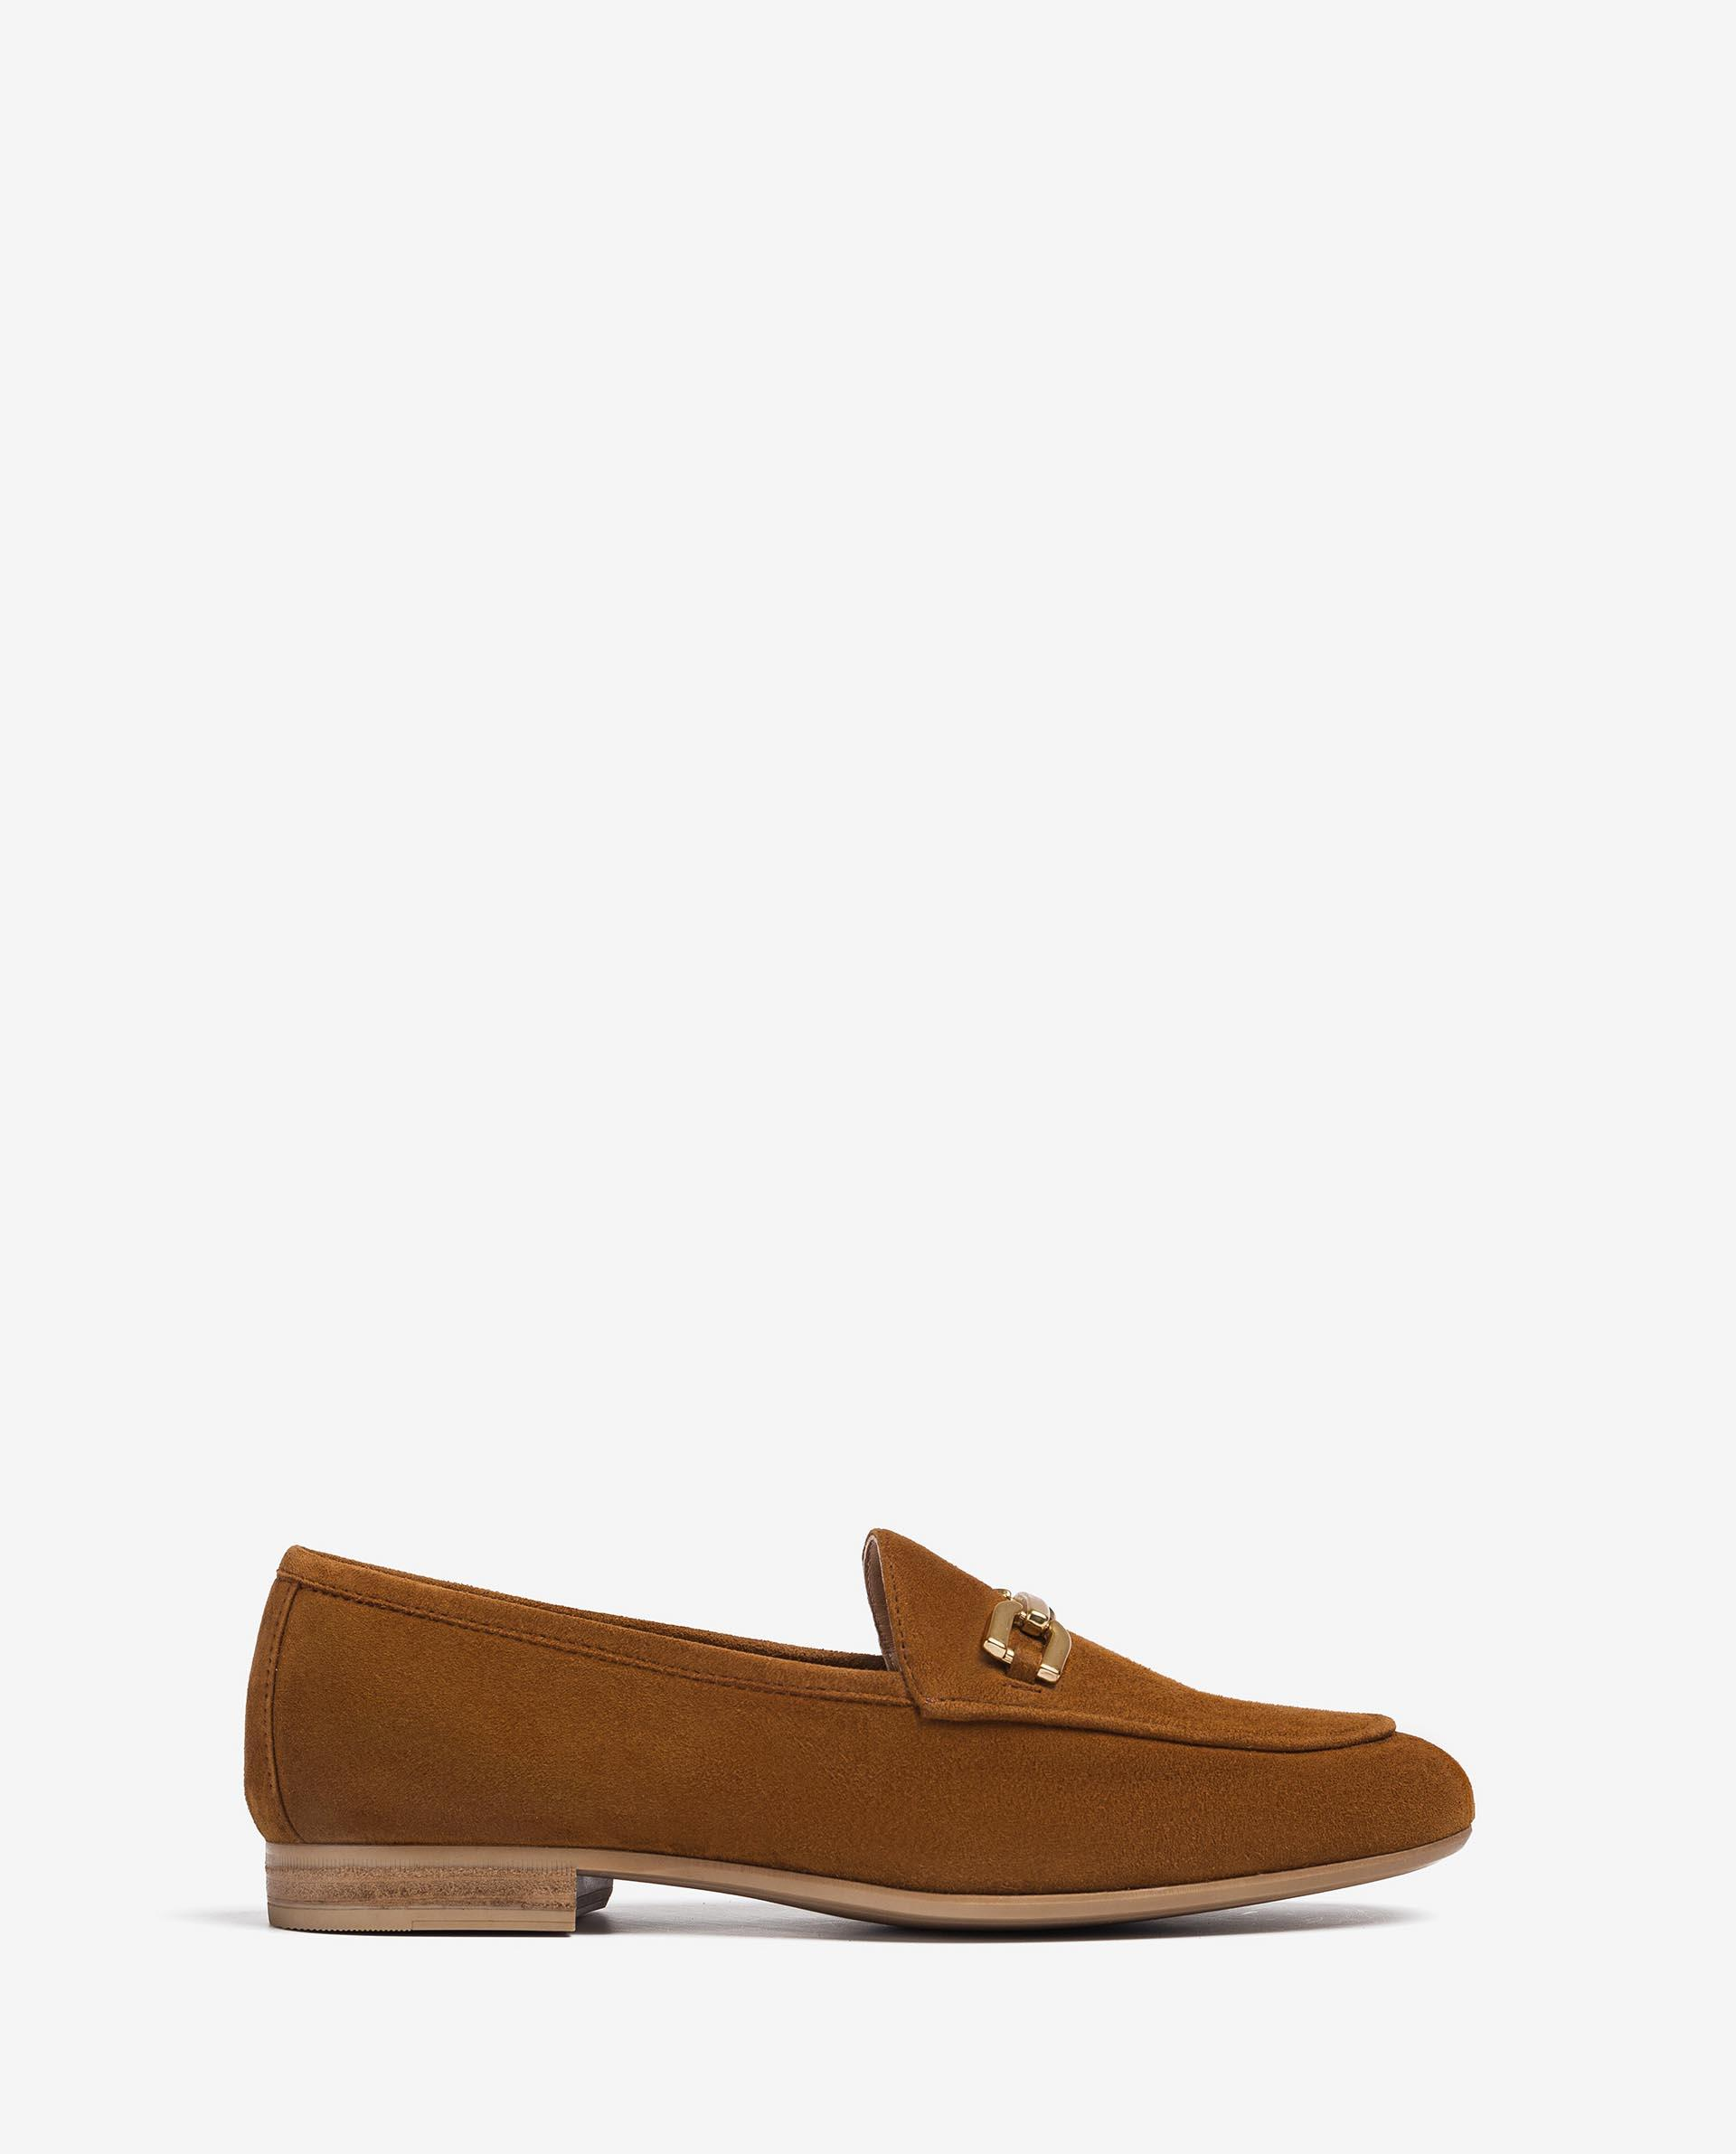 UNISA Kid suede loafers DALCY_21_KS 2